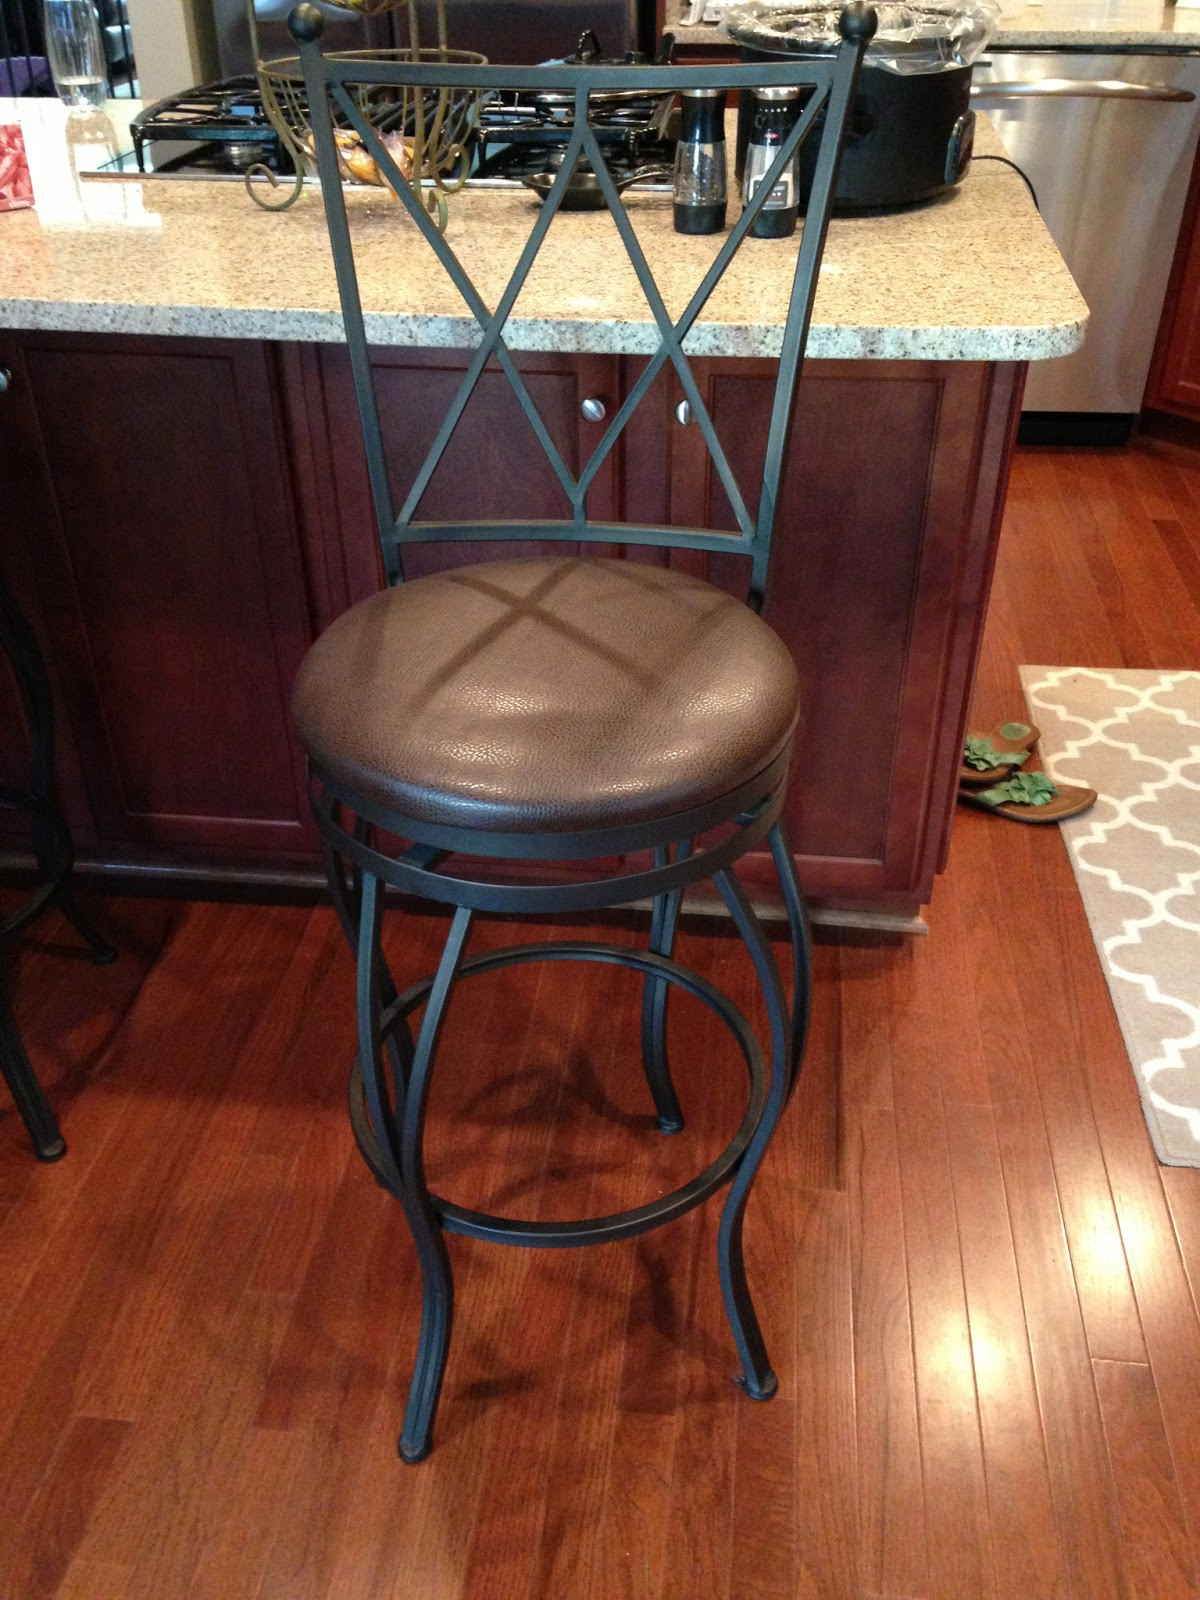 House of Thrifty Decor: Craigslist Find...New Bar Stools